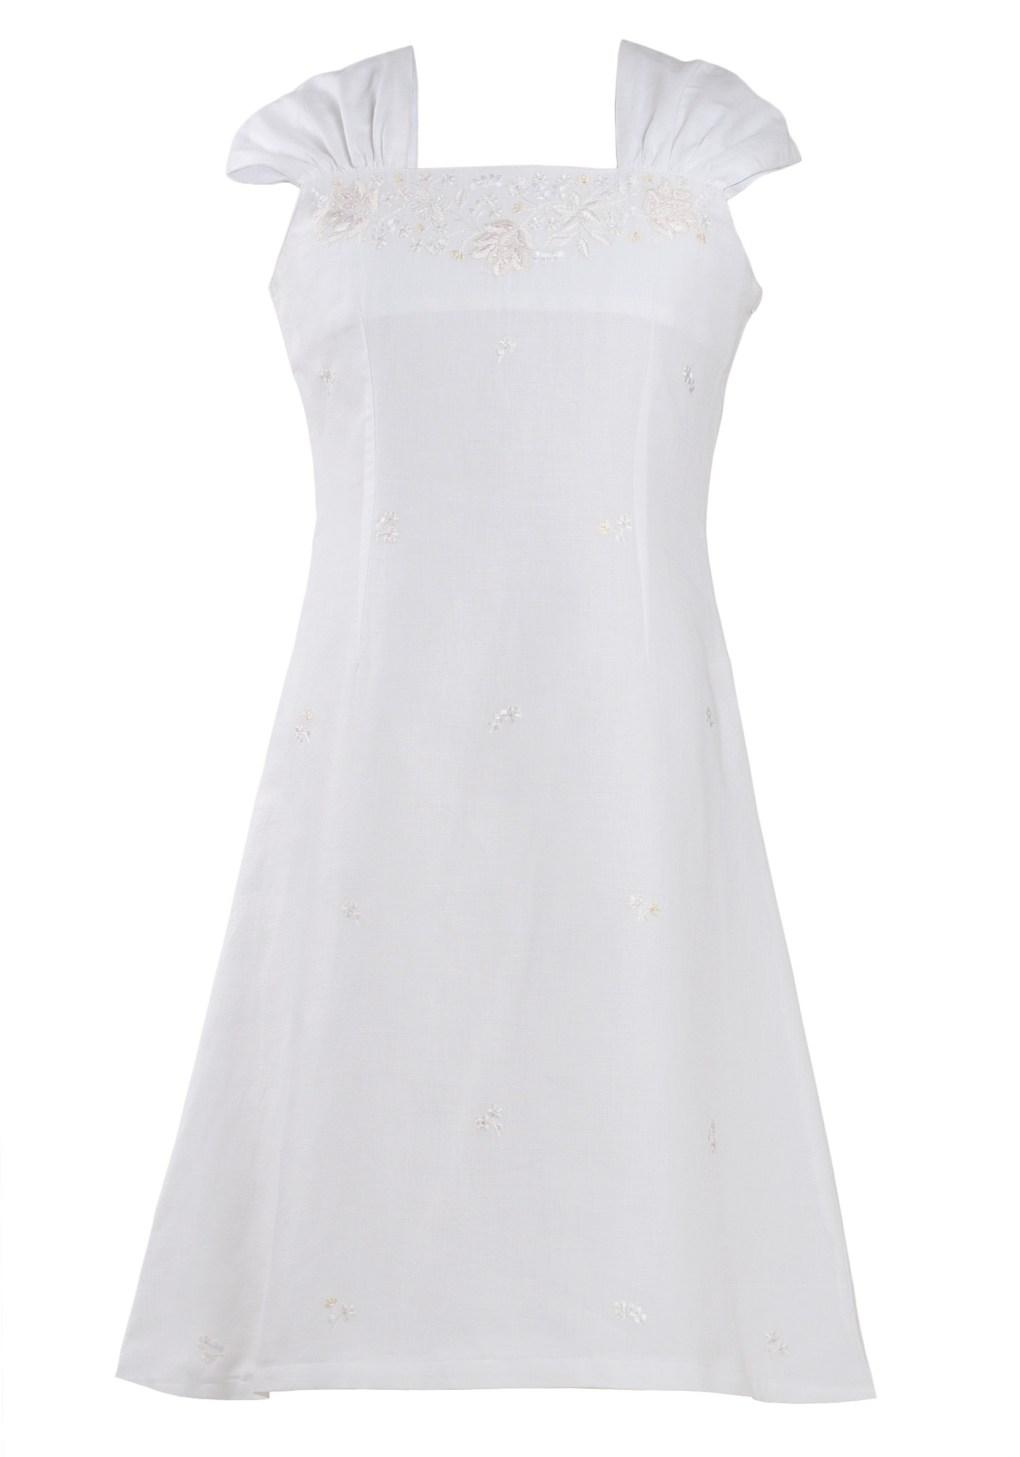 MINC Petite Summer Love Girls Short Dress in White Cotton Linen